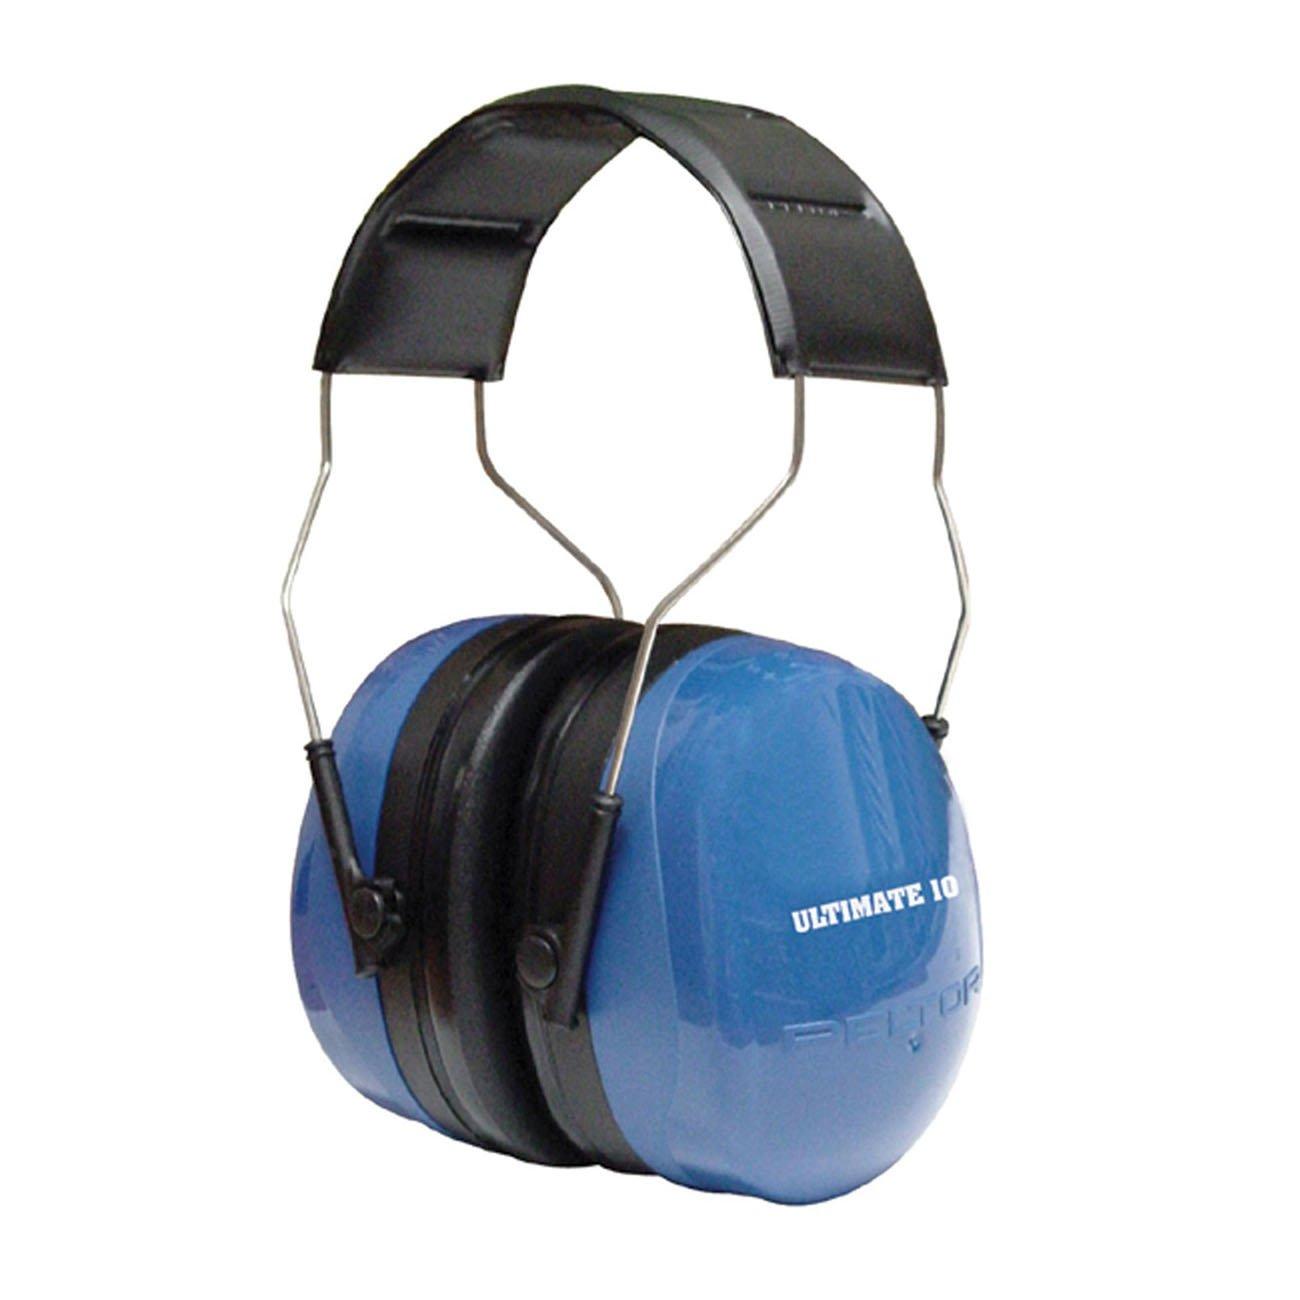 3M Peltor ぺルター ヒアリングプロテクター Ultimate 10 Hearing Protector  B000PW98WO